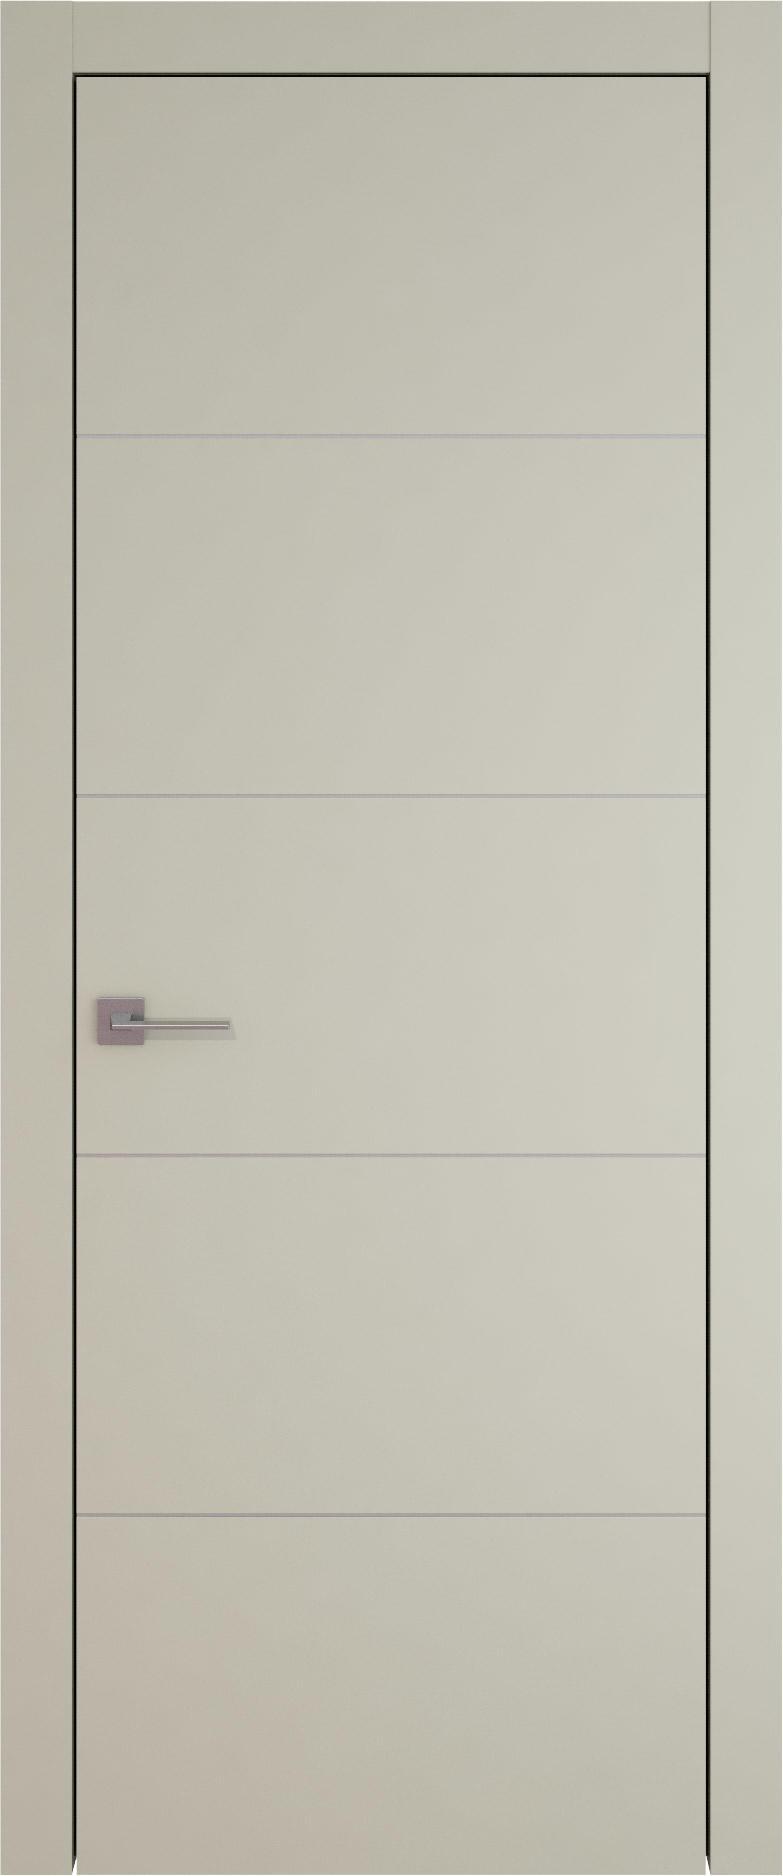 Tivoli Д-3 цвет - Серо-оливковая эмаль (RAL 7032) Без стекла (ДГ)